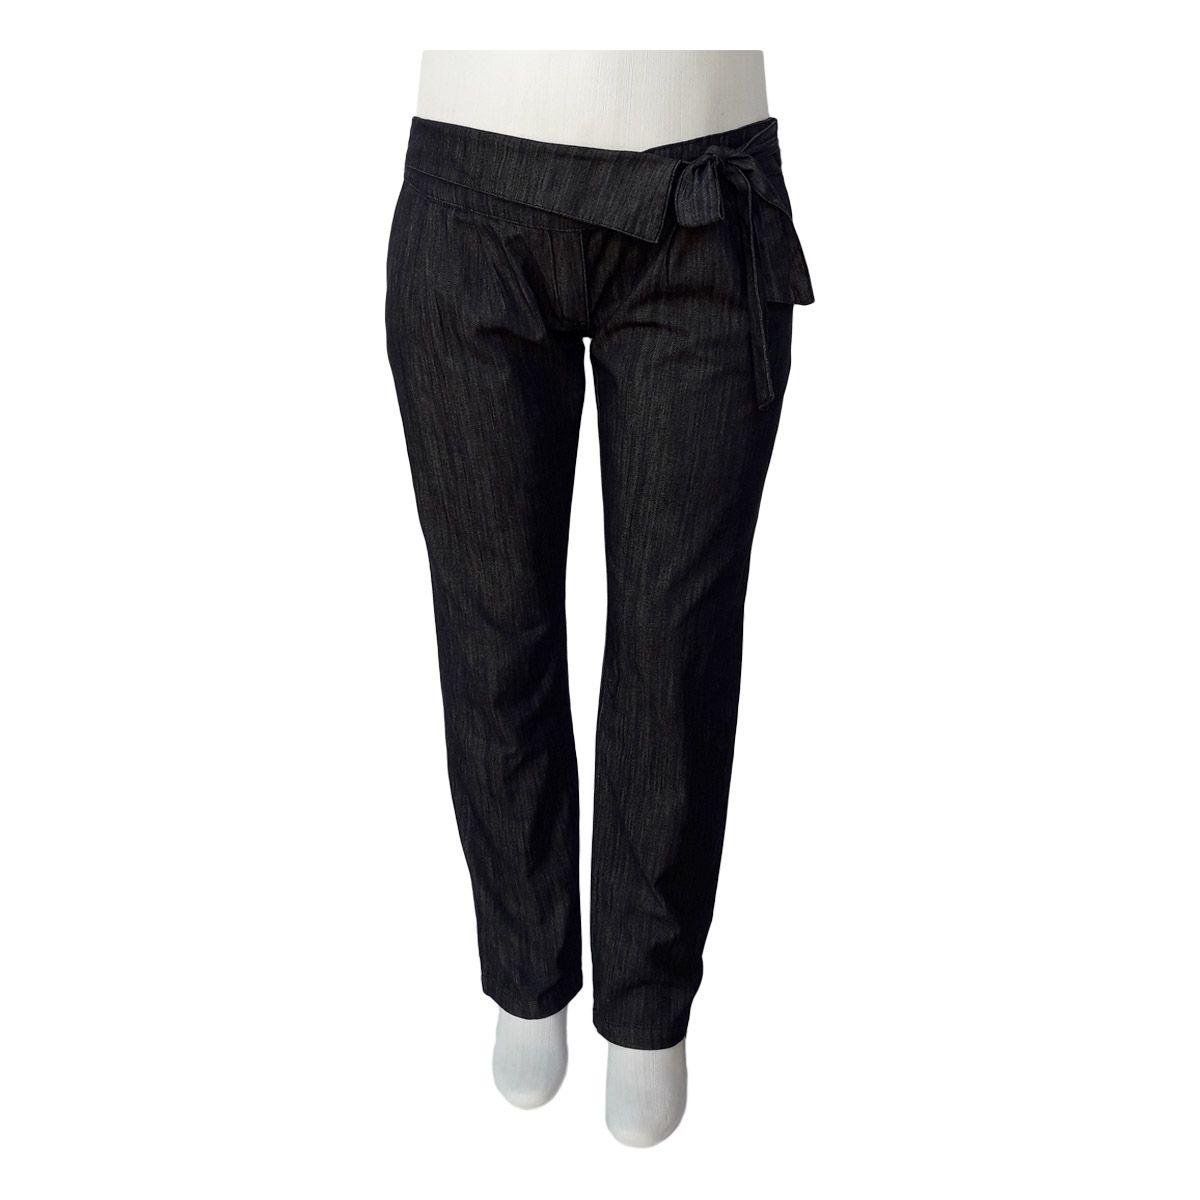 Calça Jeans Feminina Clochard Cintura Baixa